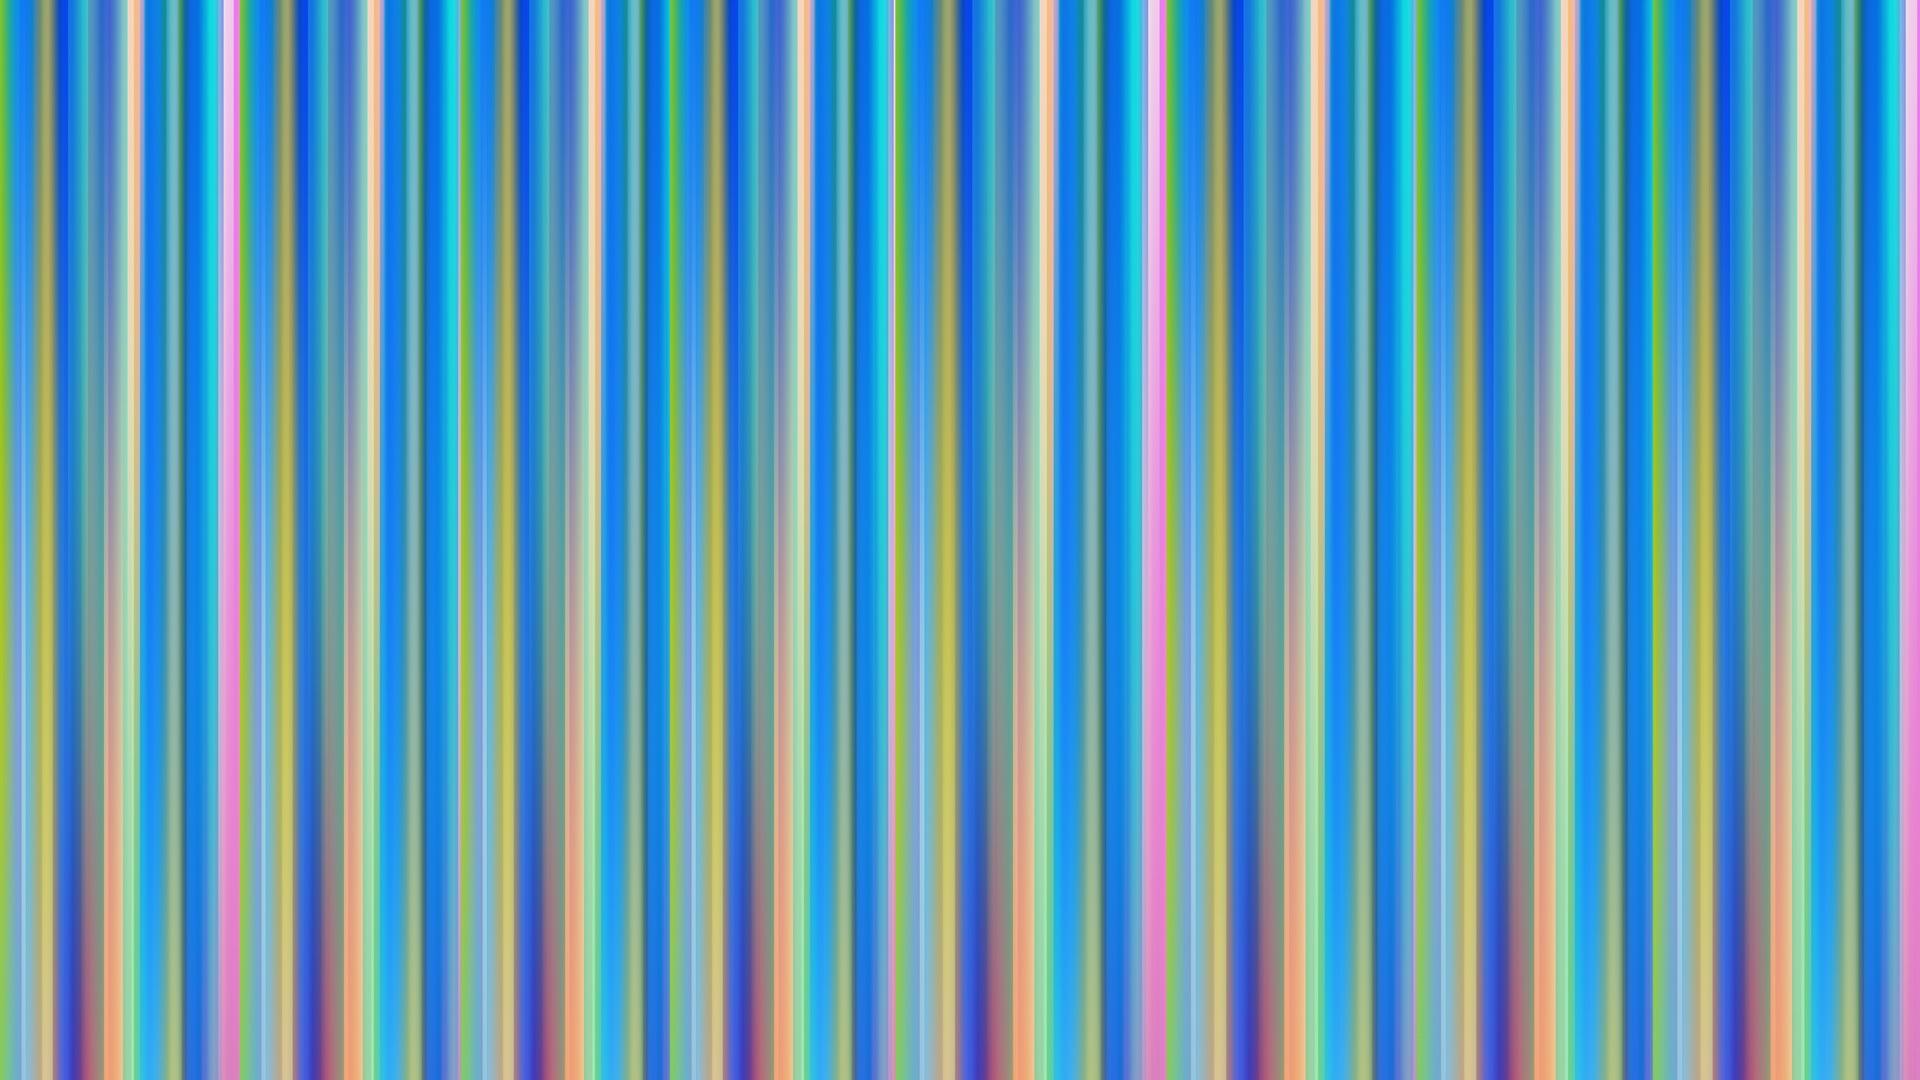 1920x1080 Colorful Aesthetics Pattern Background Laptop Full